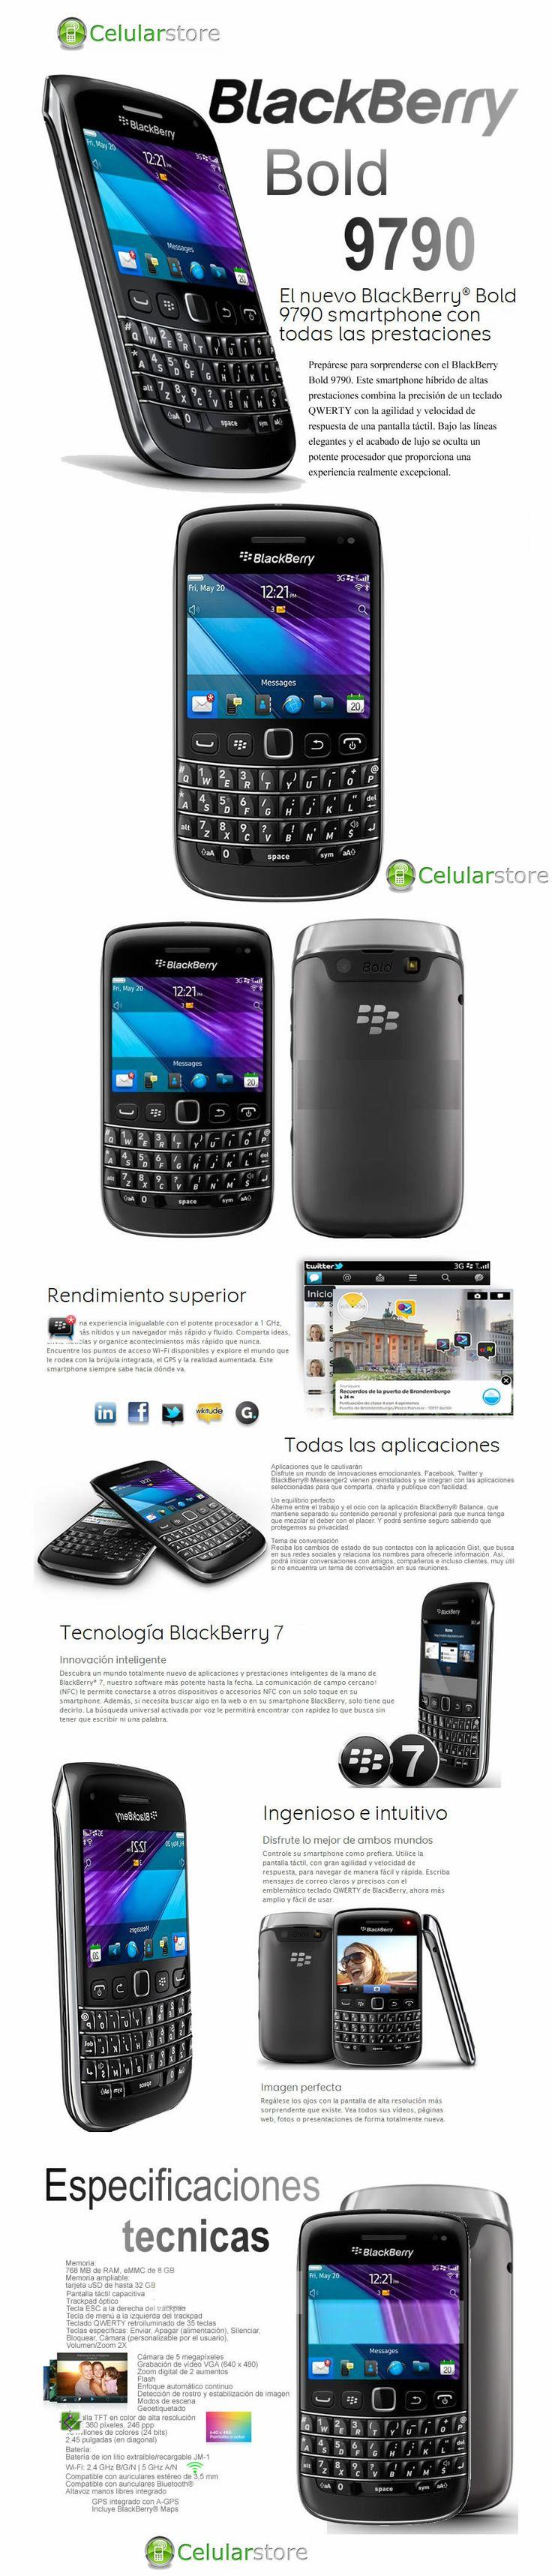 compra de blackberry bols 9790 3g wifi / venta de bb bold 9790 3g wifi en argentina